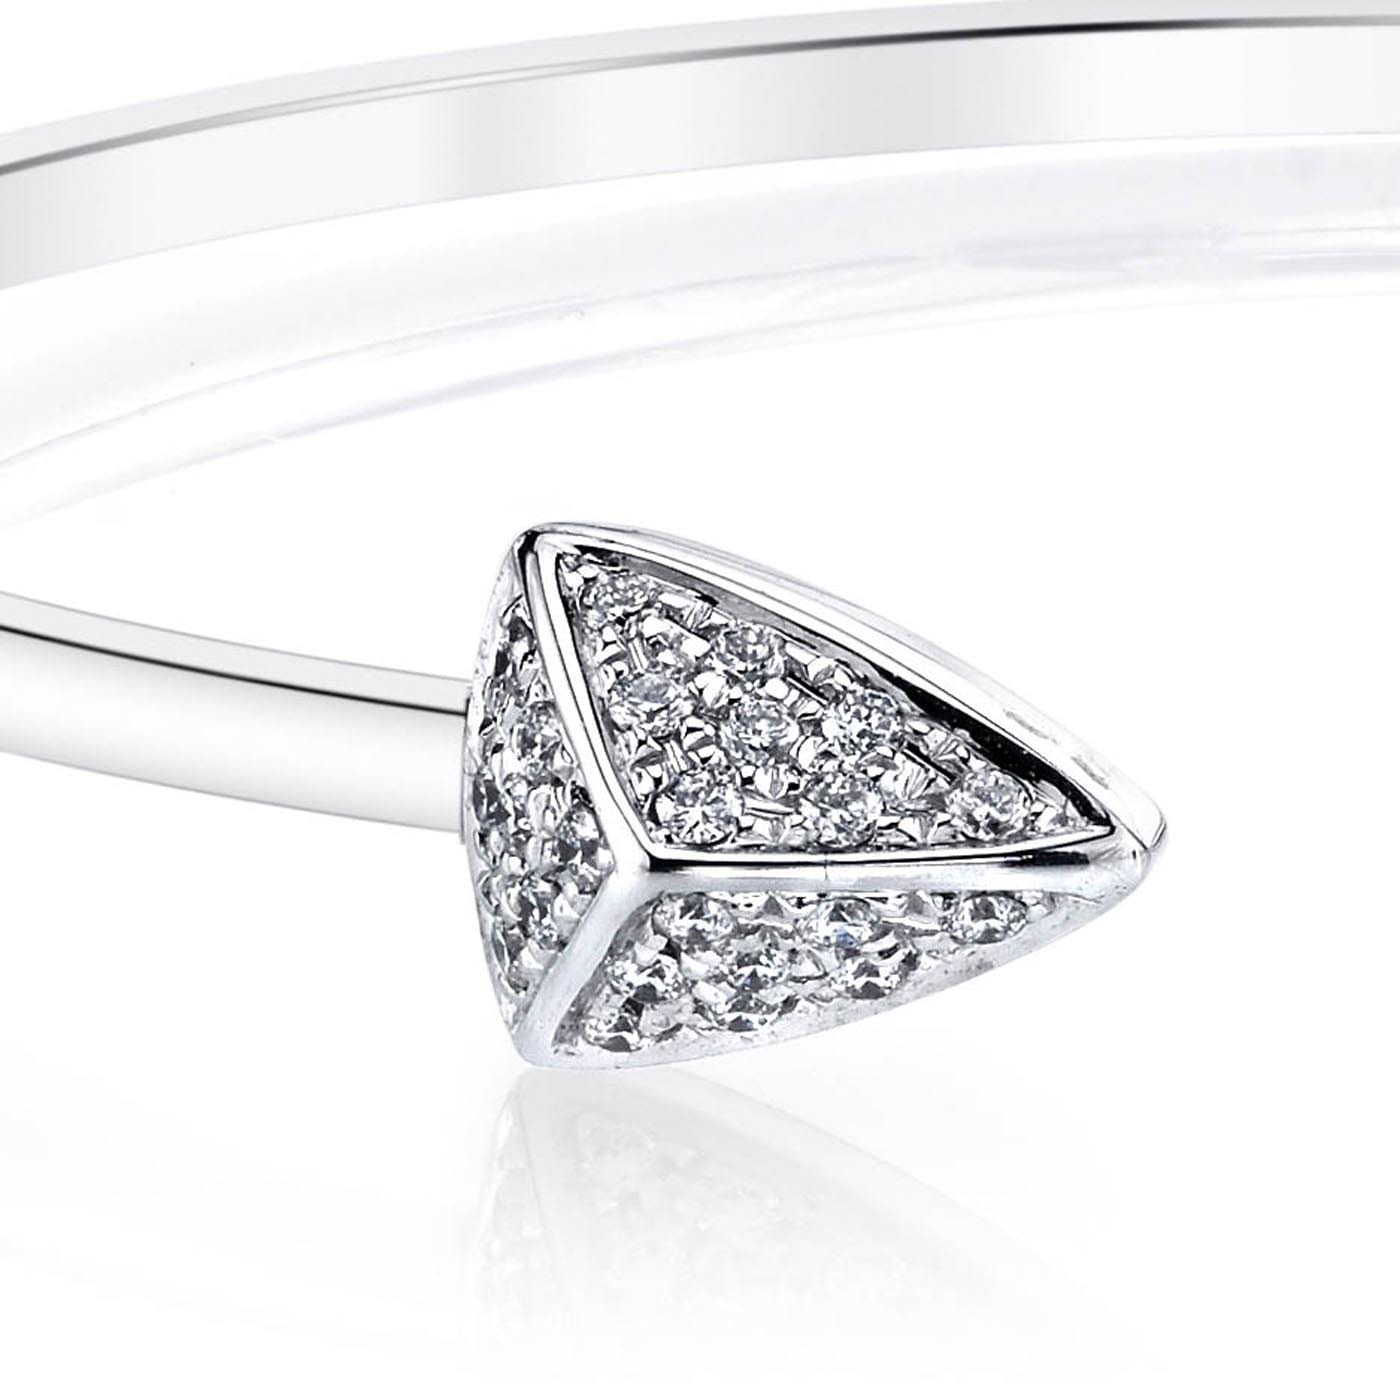 Diamond Bracelet - Bangles & Cuffs Style #: MARS-26682